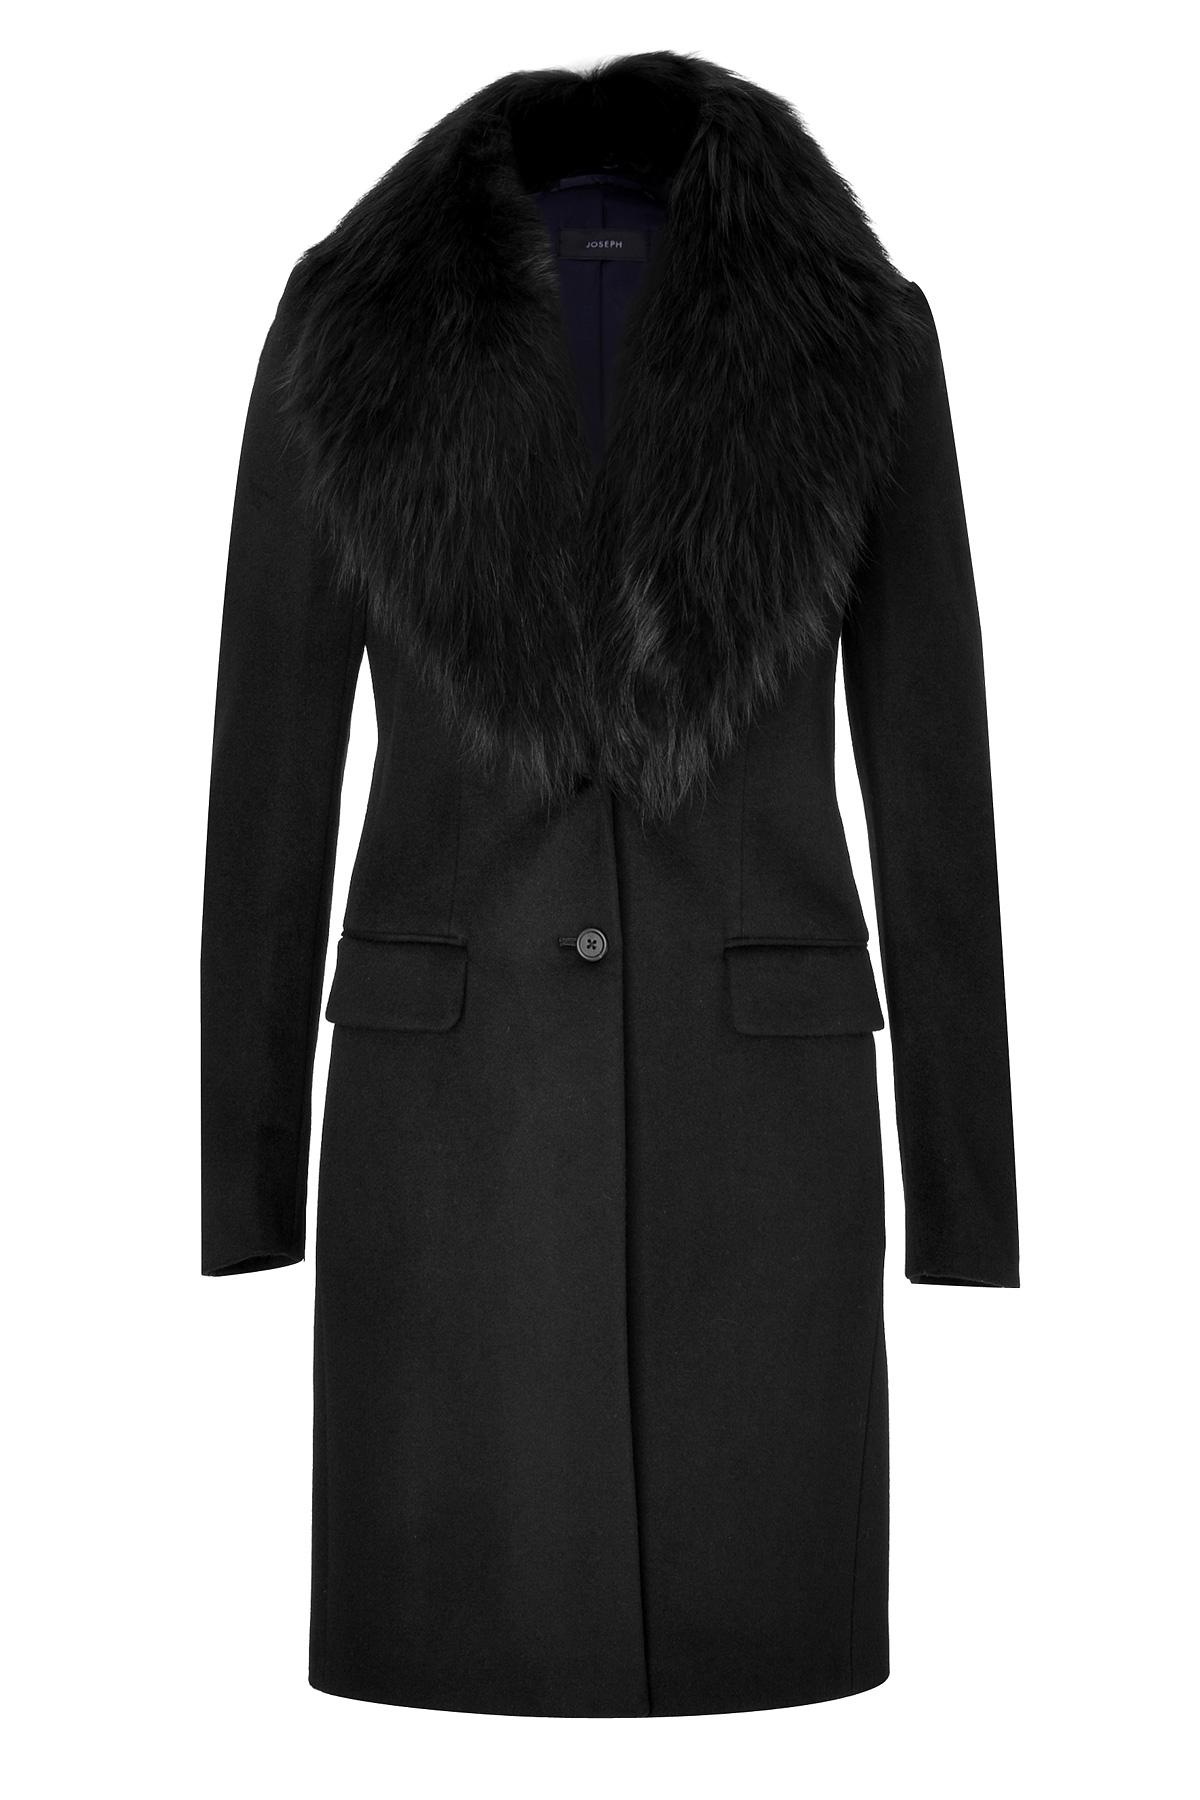 Joseph Wool-Cashmere Coat With Fur Collar in Black | Lyst